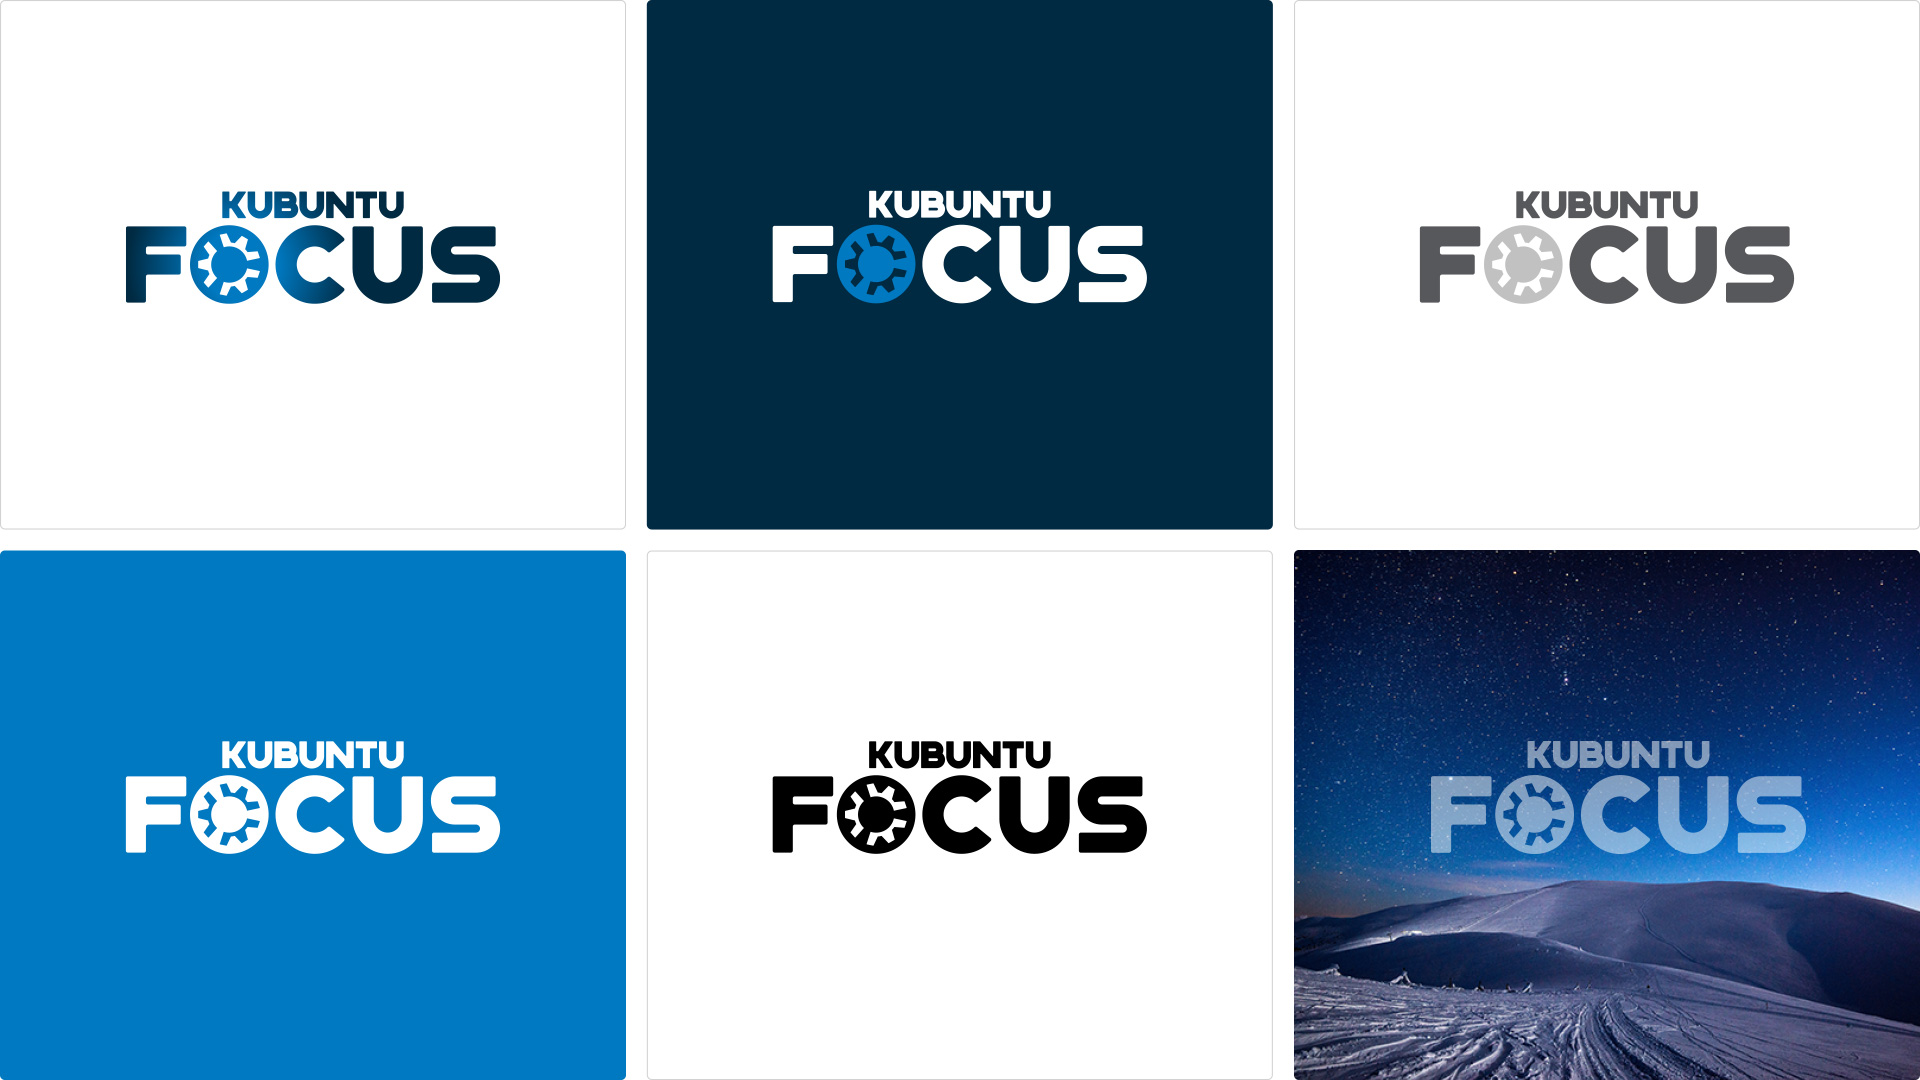 04-kfocus-logo_variations